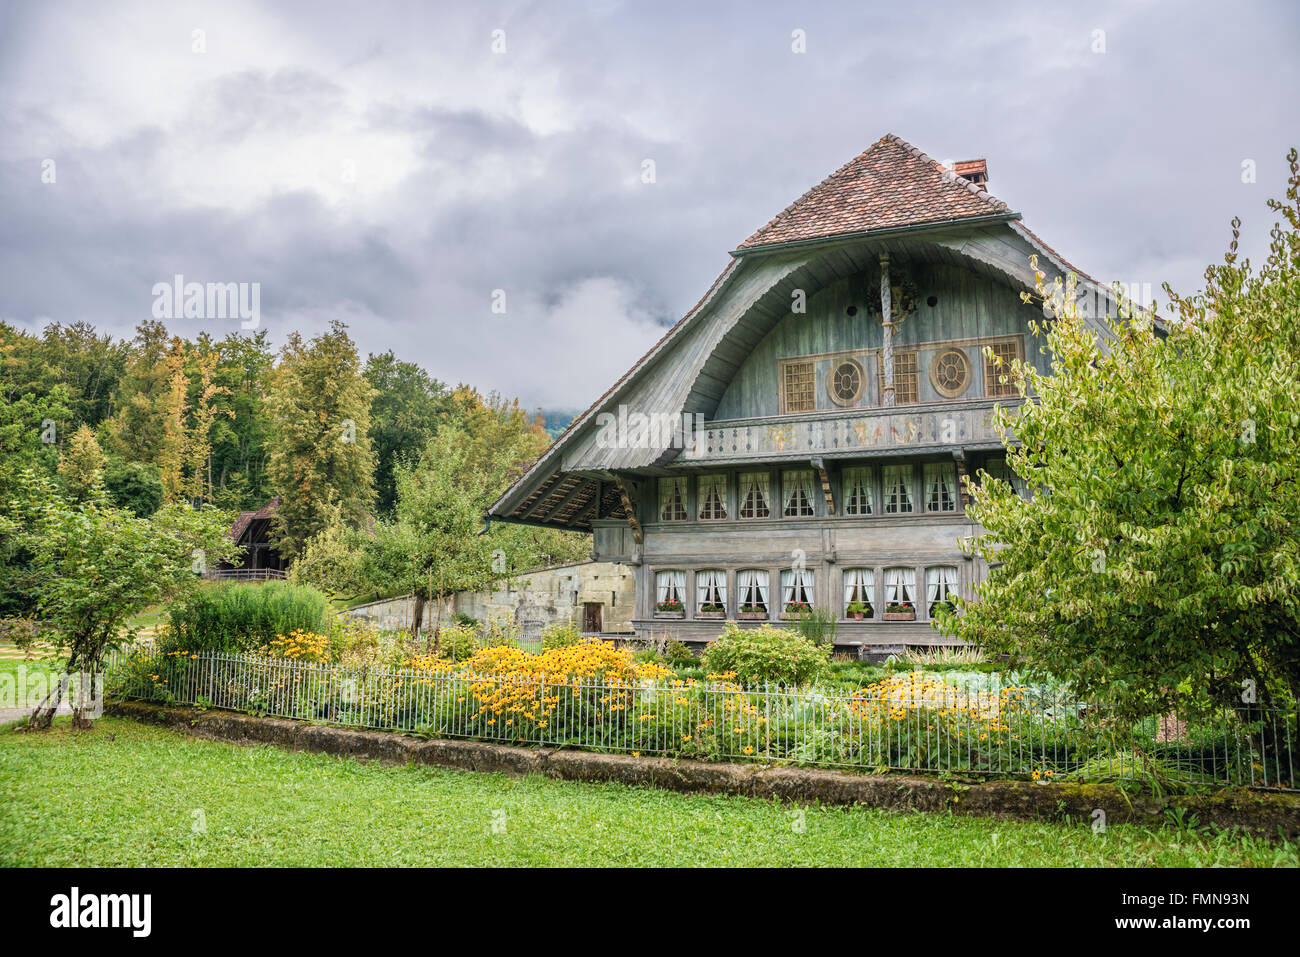 Farmhouse of Ostermundingen, Open Air Museum Ballenberg, Switzerland | Farmhaus von Ostermundingen, Freilichtmuseum - Stock Image